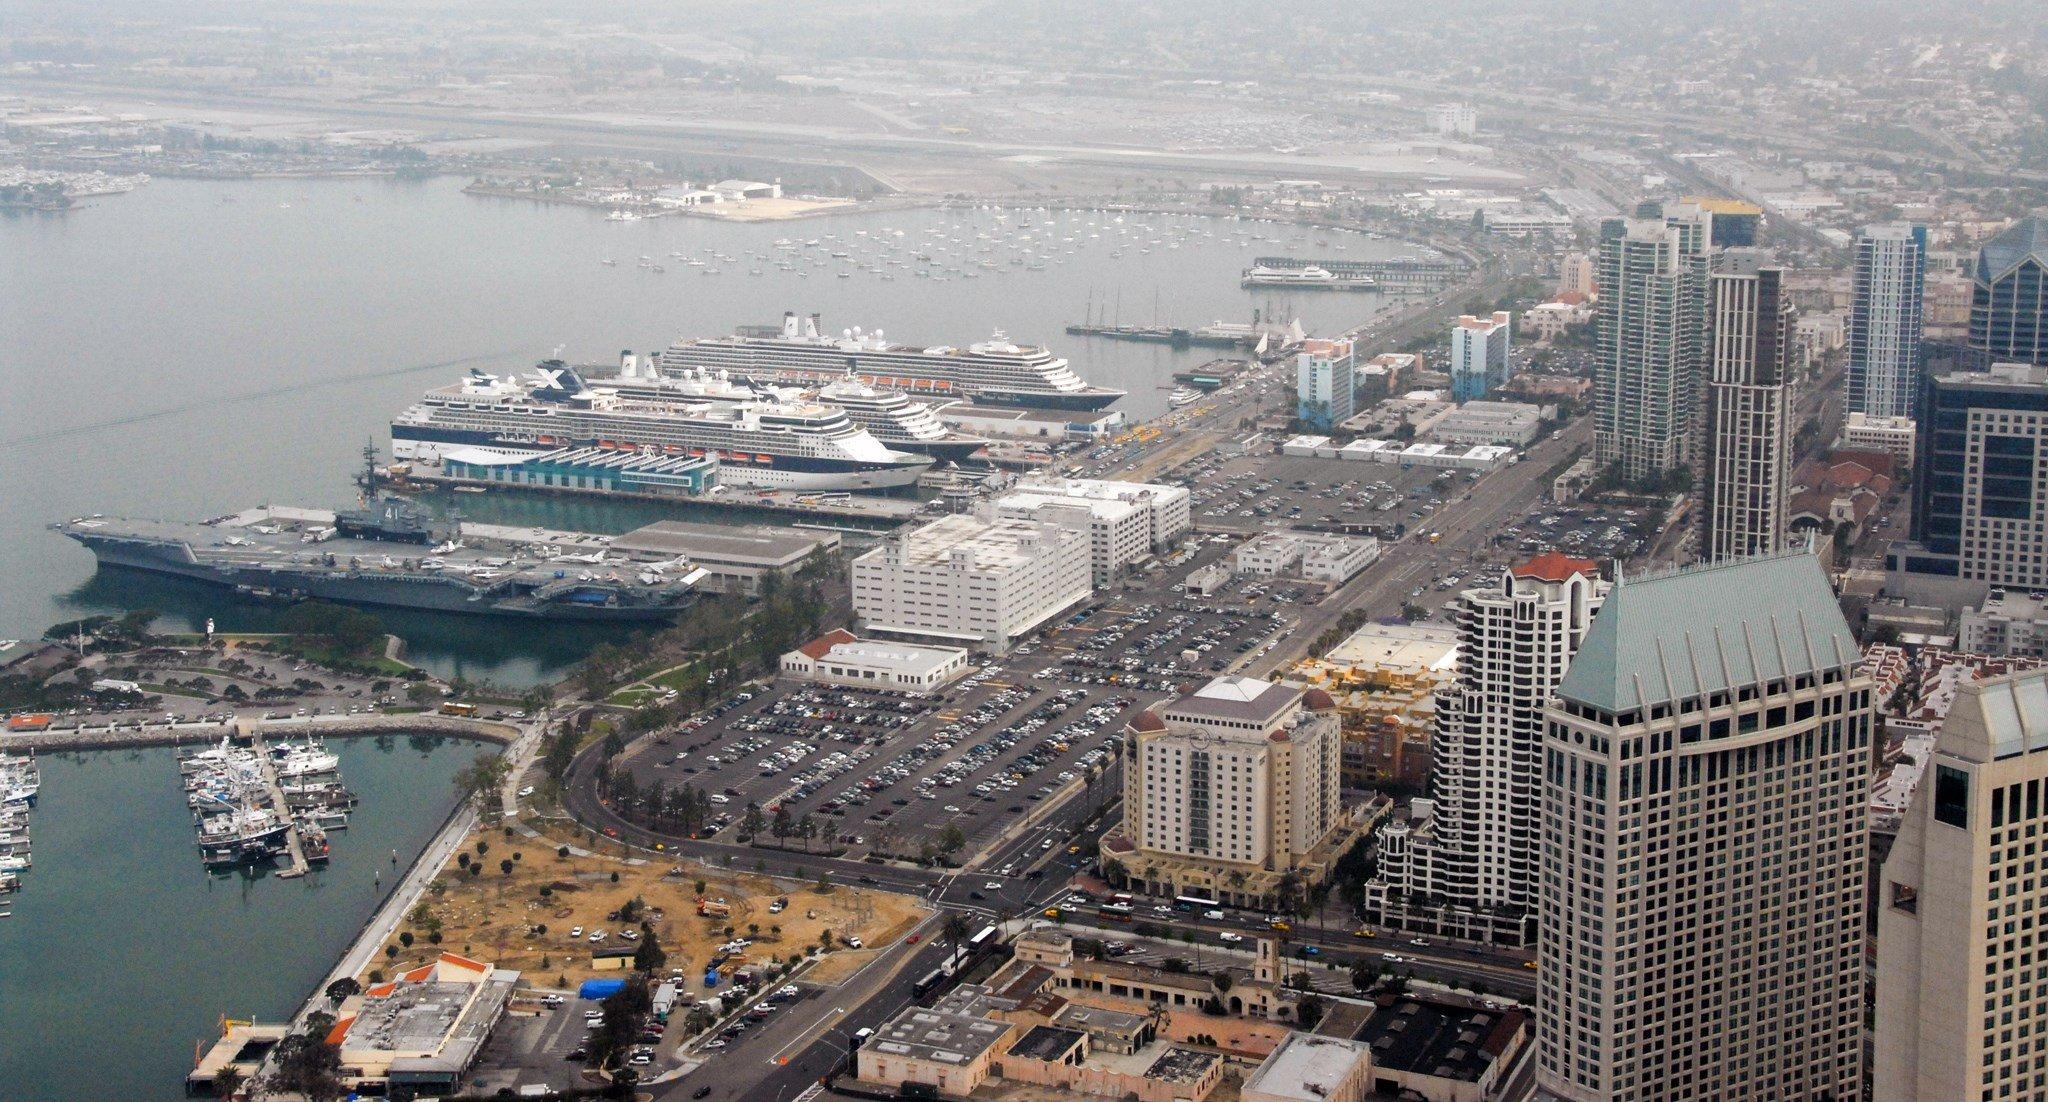 (Source: Port of San Diego)